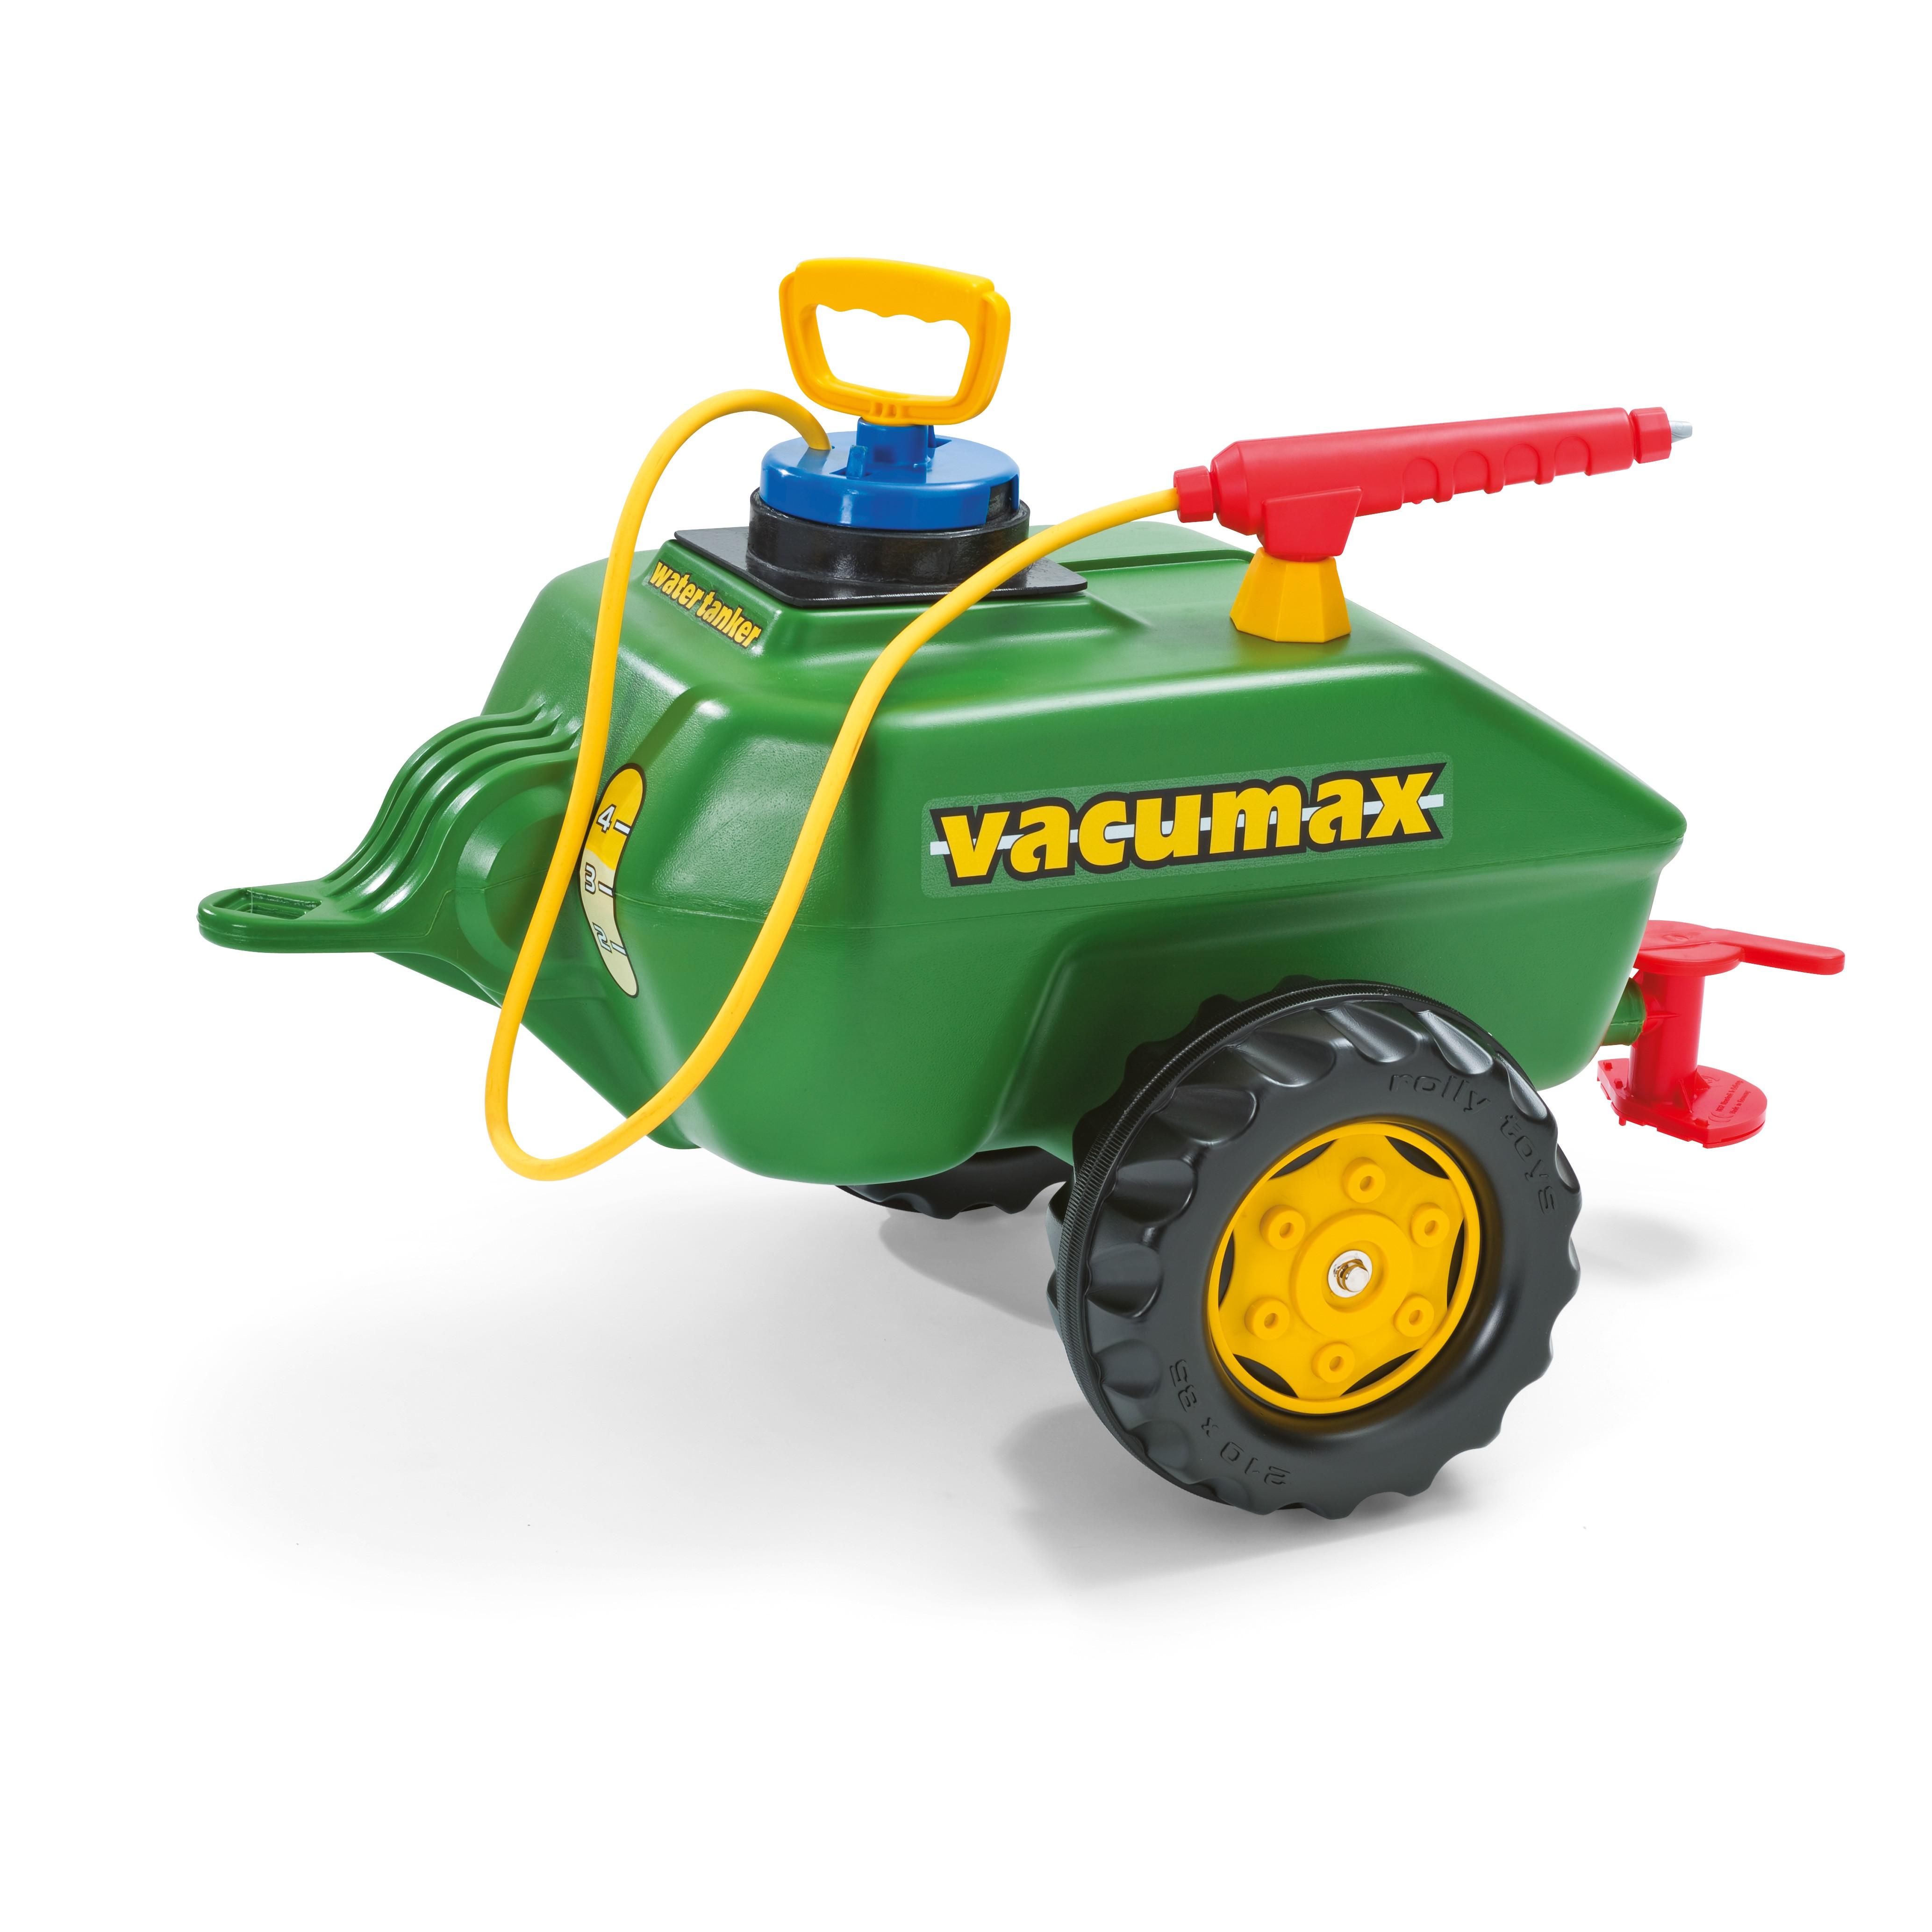 Anhänger für Tretfahrzeug rolly Vacumax - Rolly Toys Bild 1